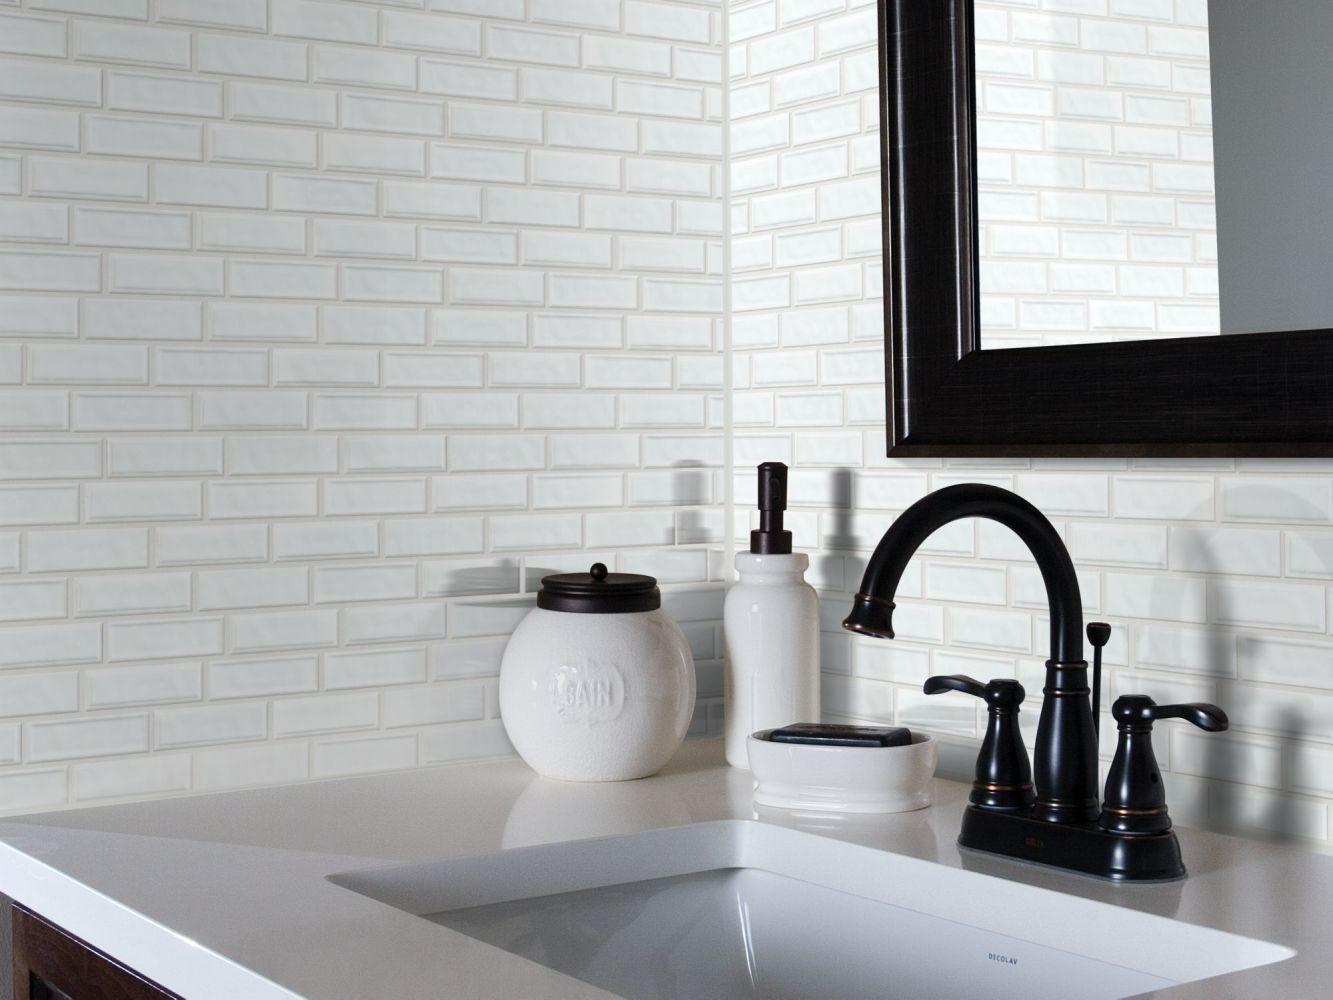 Shaw Floors Toll Brothers Ceramics Geoscapes Random Linear Mosaic White 00100_TL45C